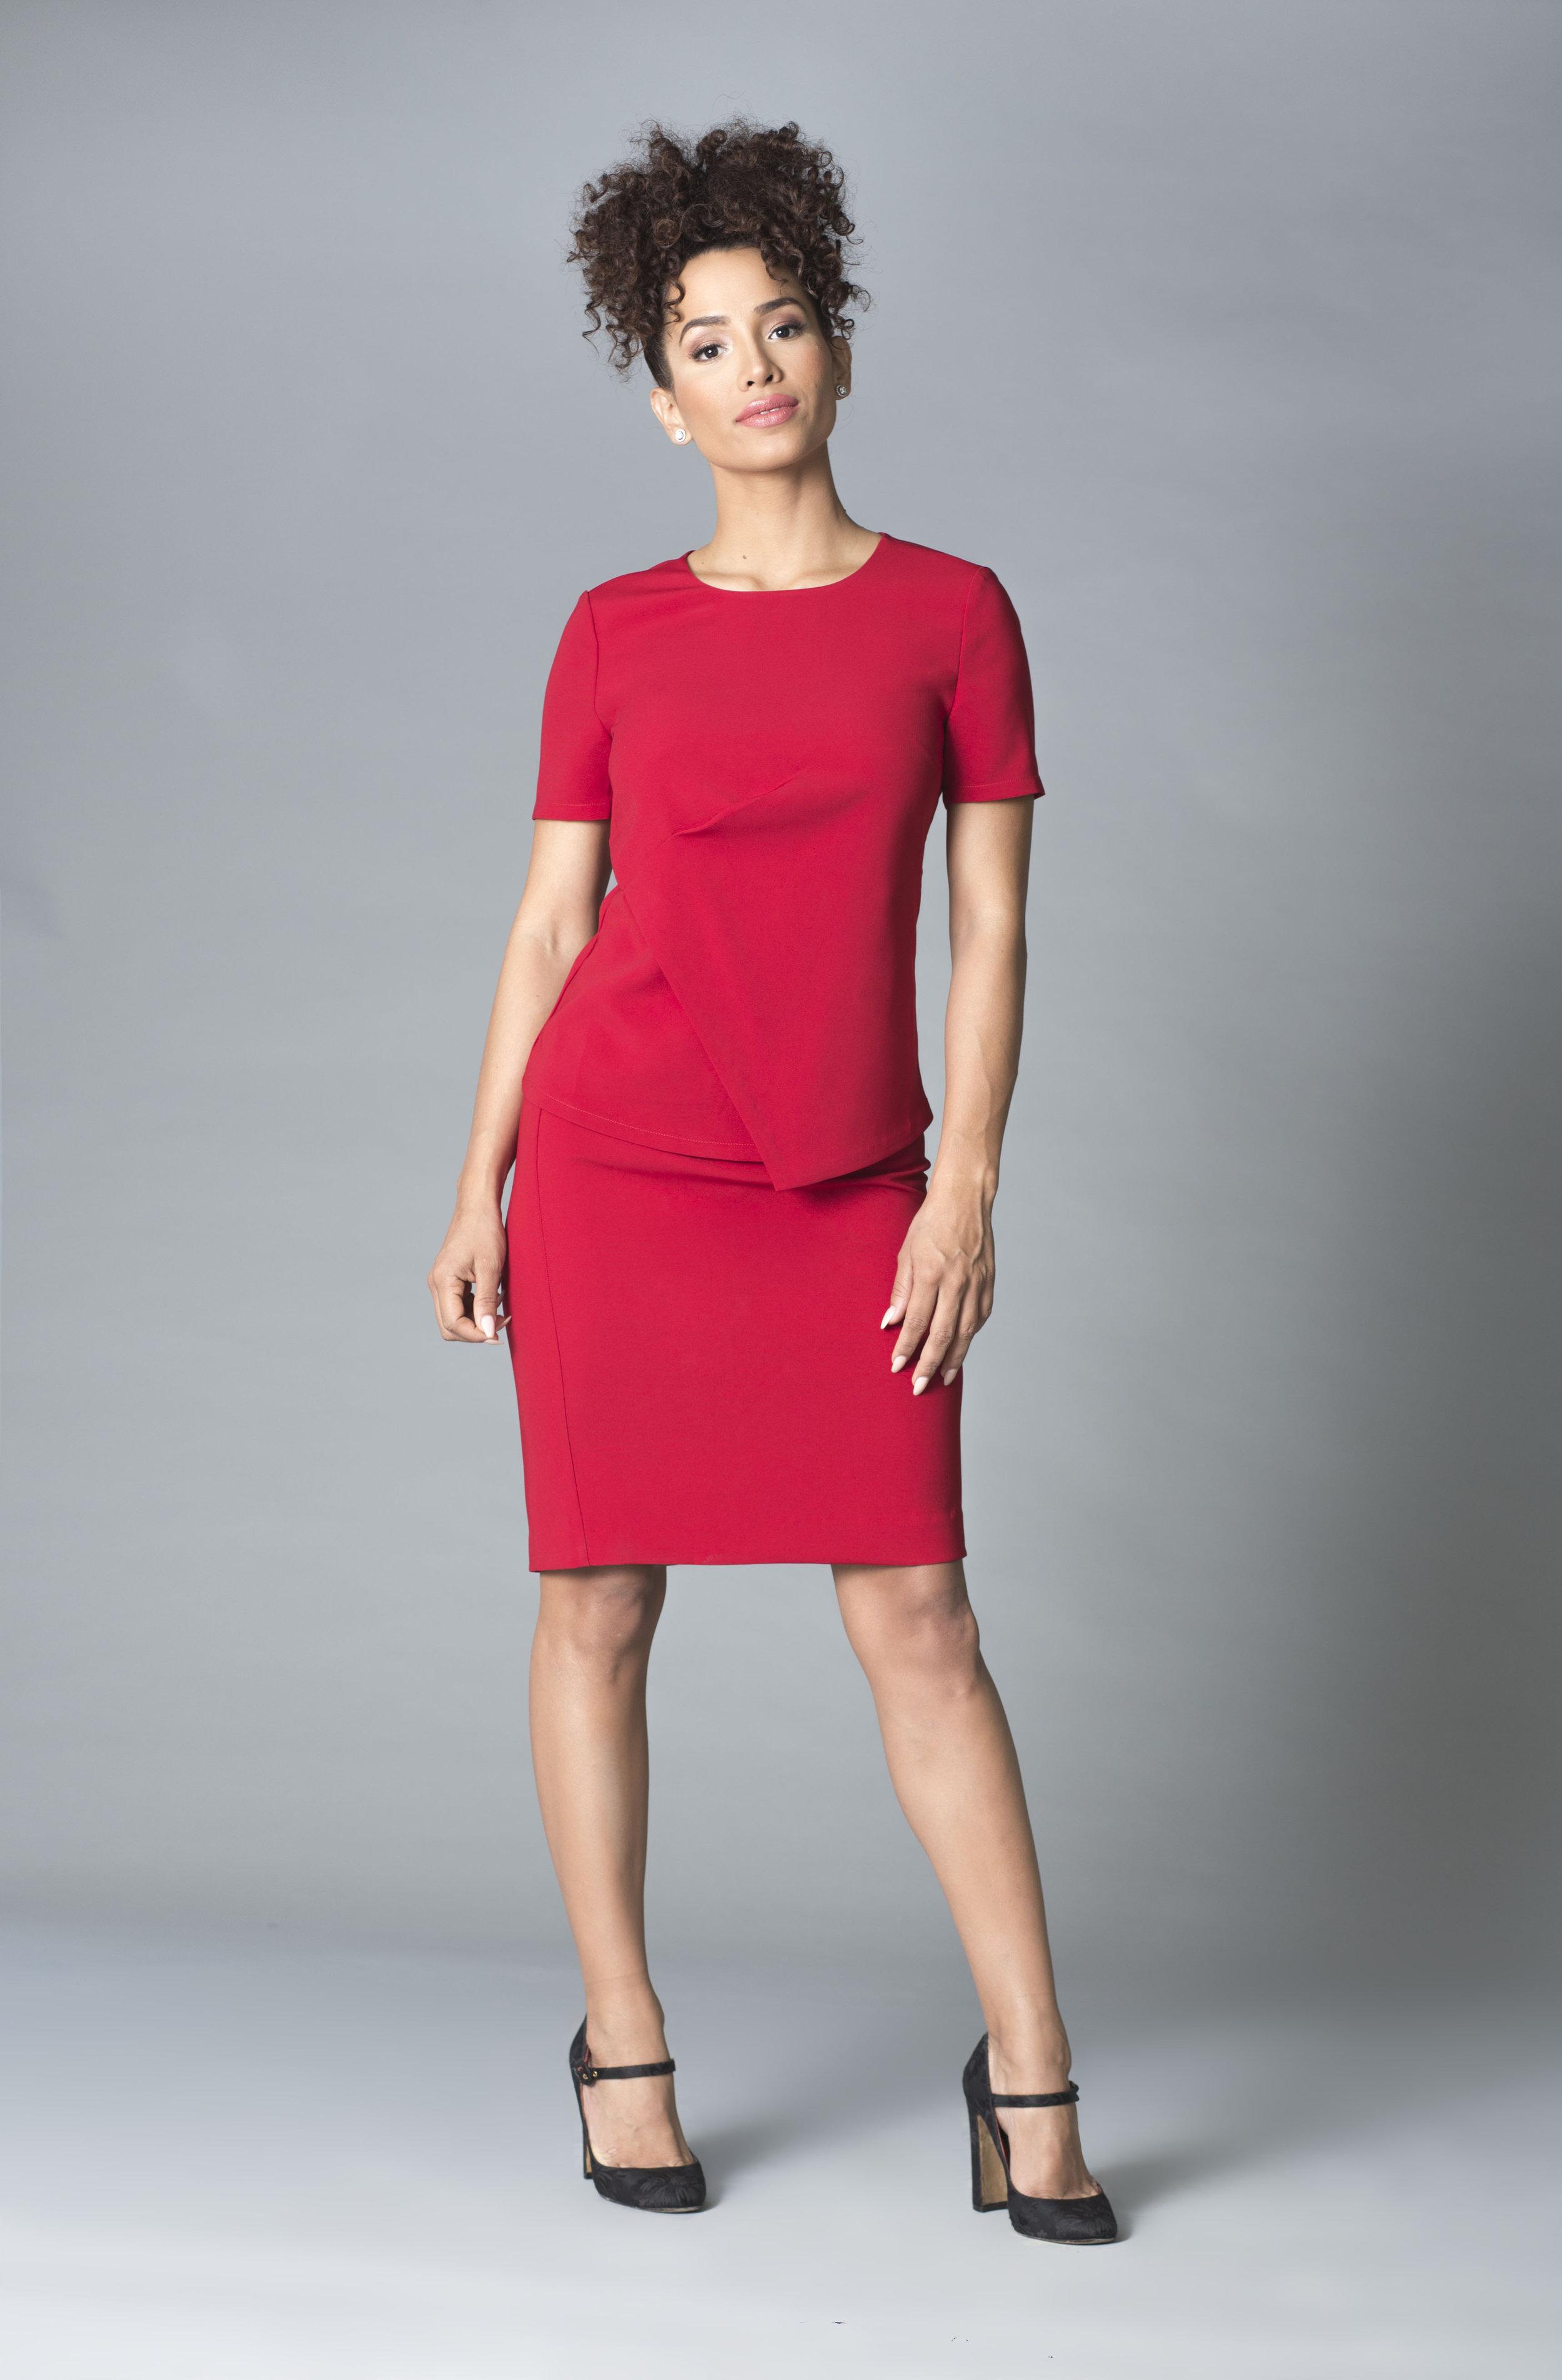 MRC  Amelie y falda rojo copy.jpg